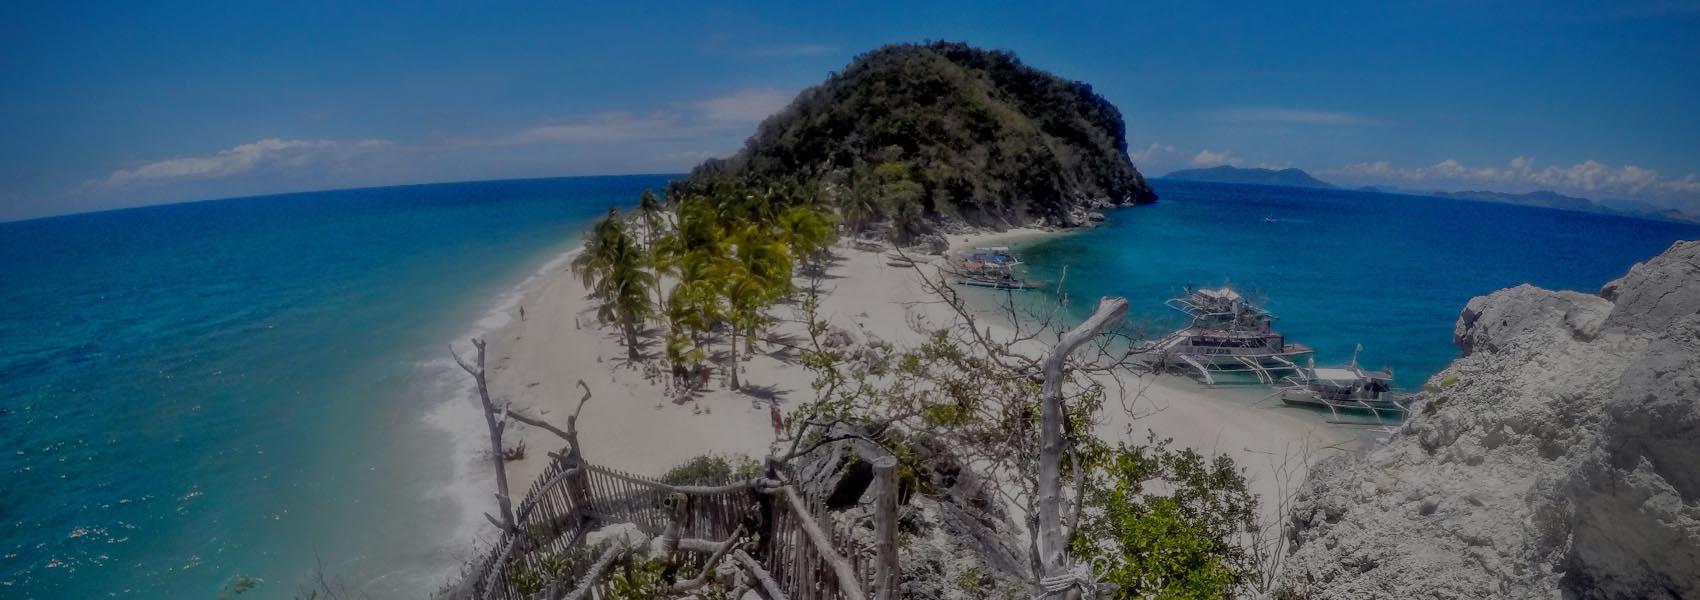 Go Native On Panay and Boracay